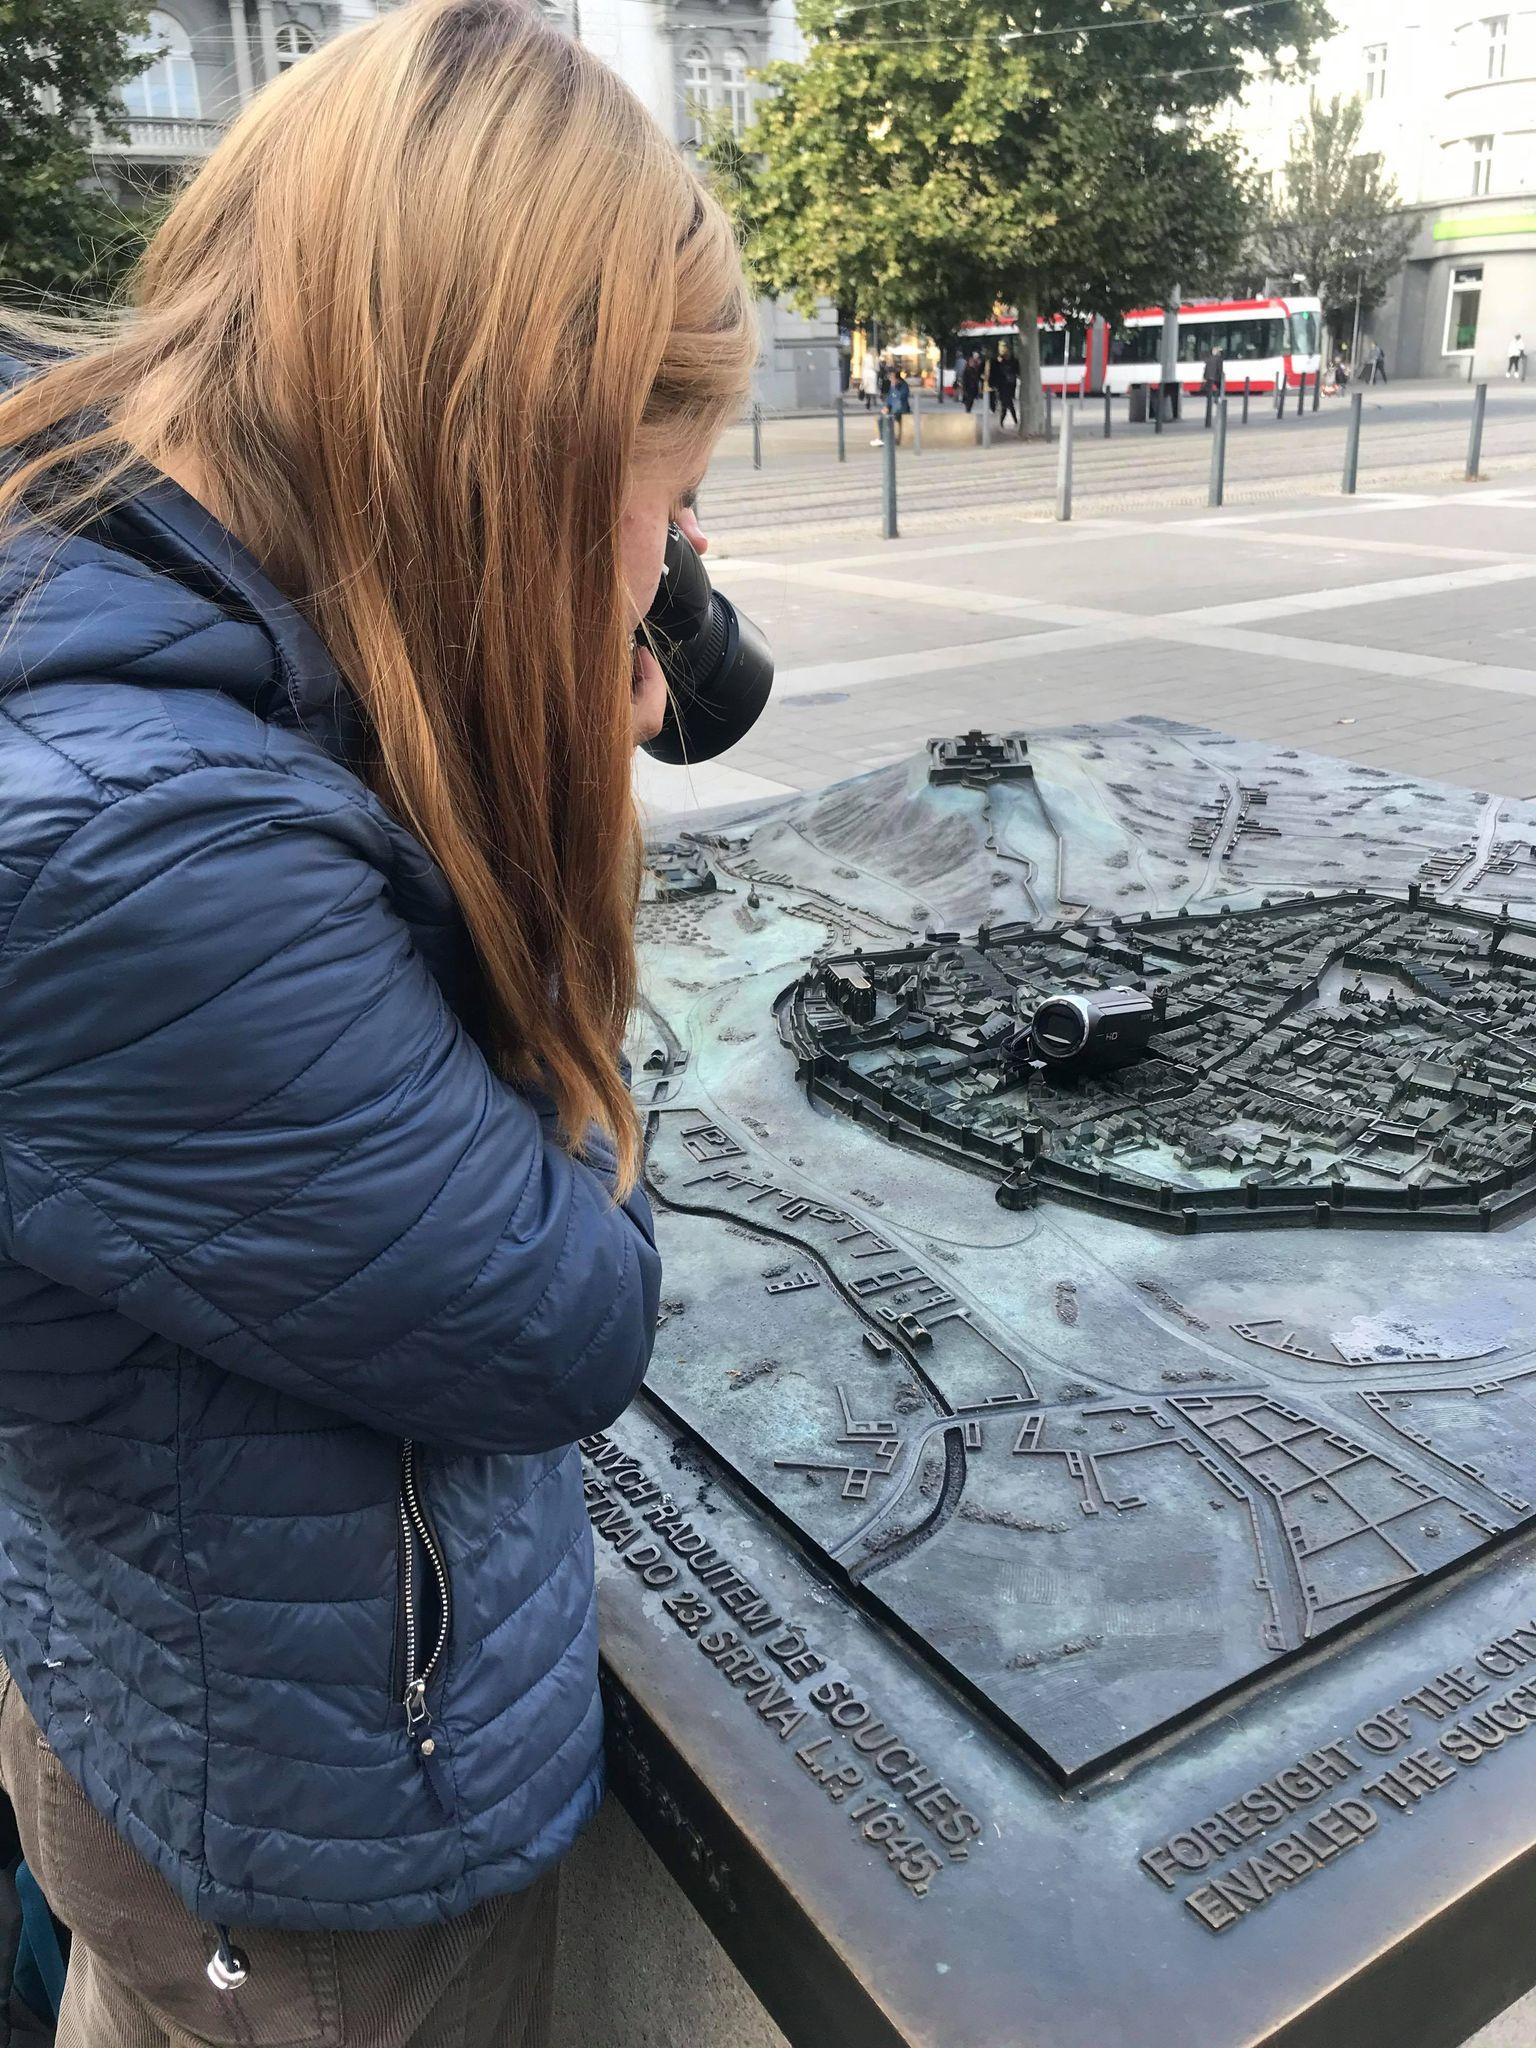 Volunteer in Brno-Mladiinfo ČR